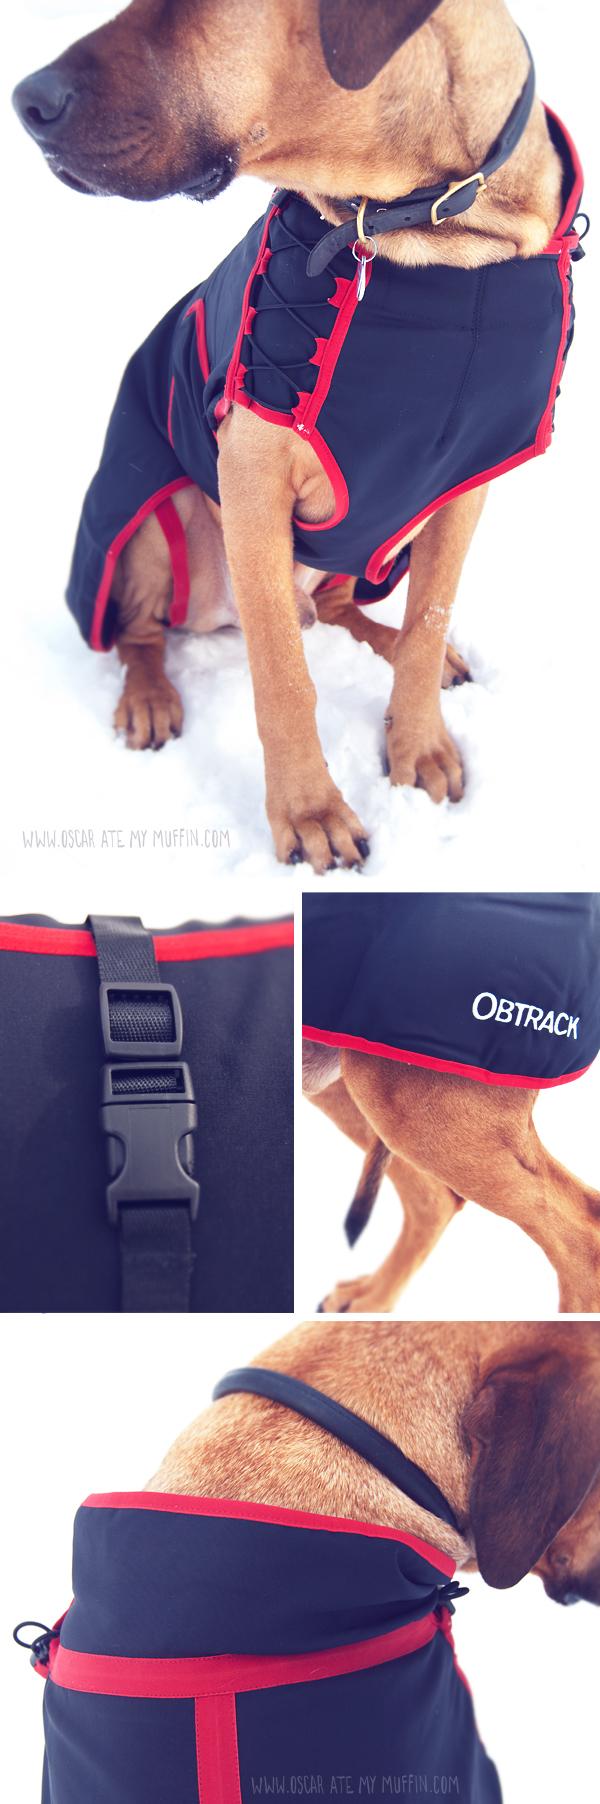 Obtrack-COMP